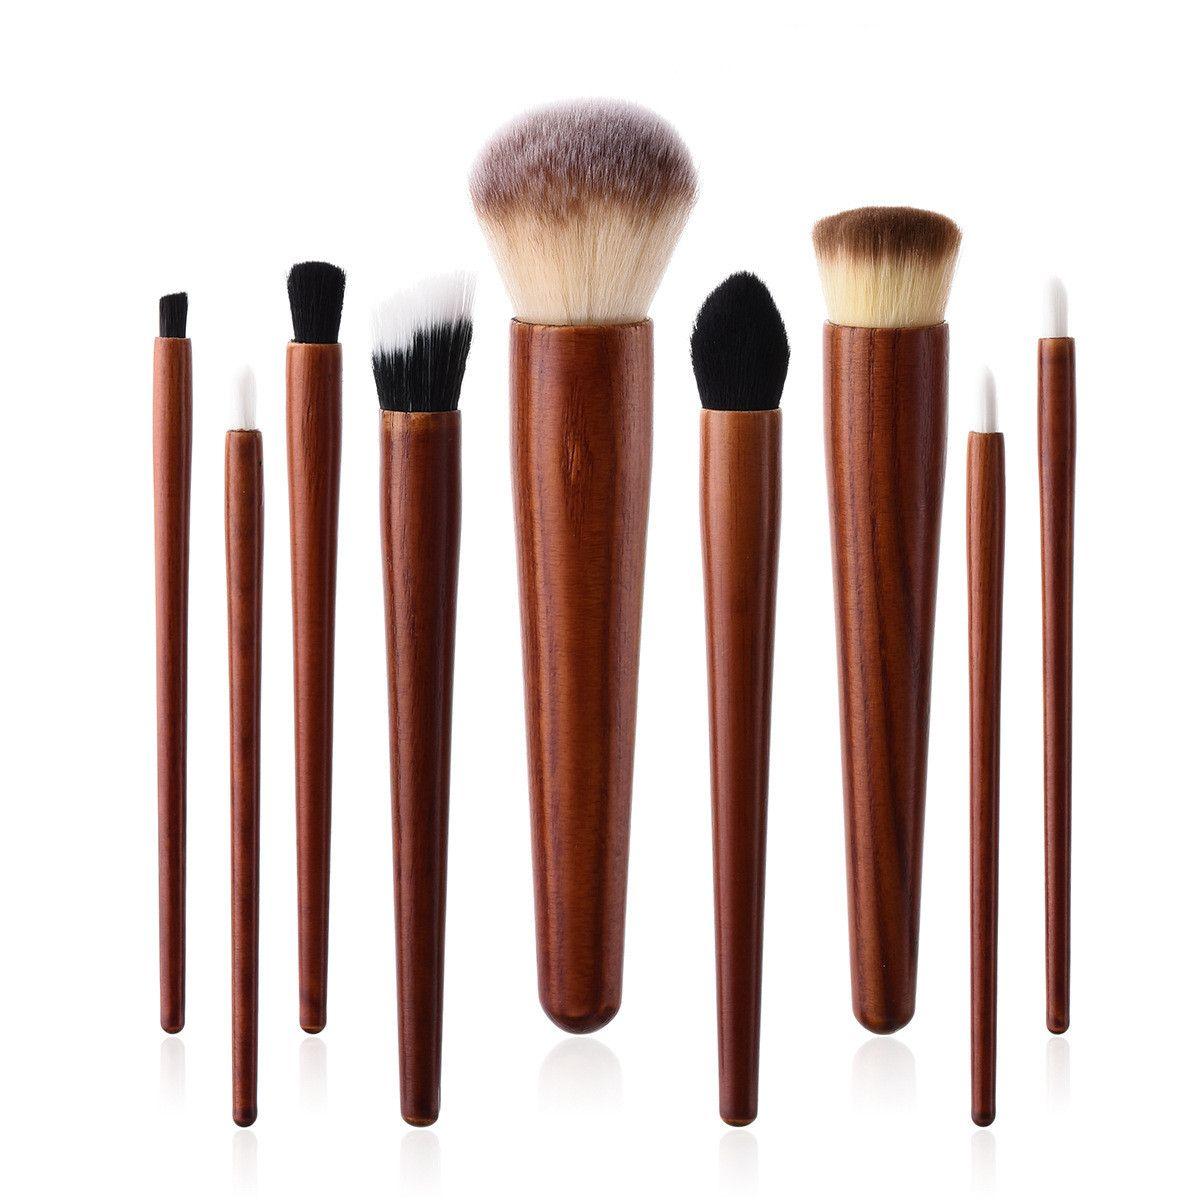 9Pcs/set Cosmetic Makeup Brushes Set Wood Handle Foundation Power Eye Shadow Brow Concealer Blending Contour Beauty Brush Tools Kits